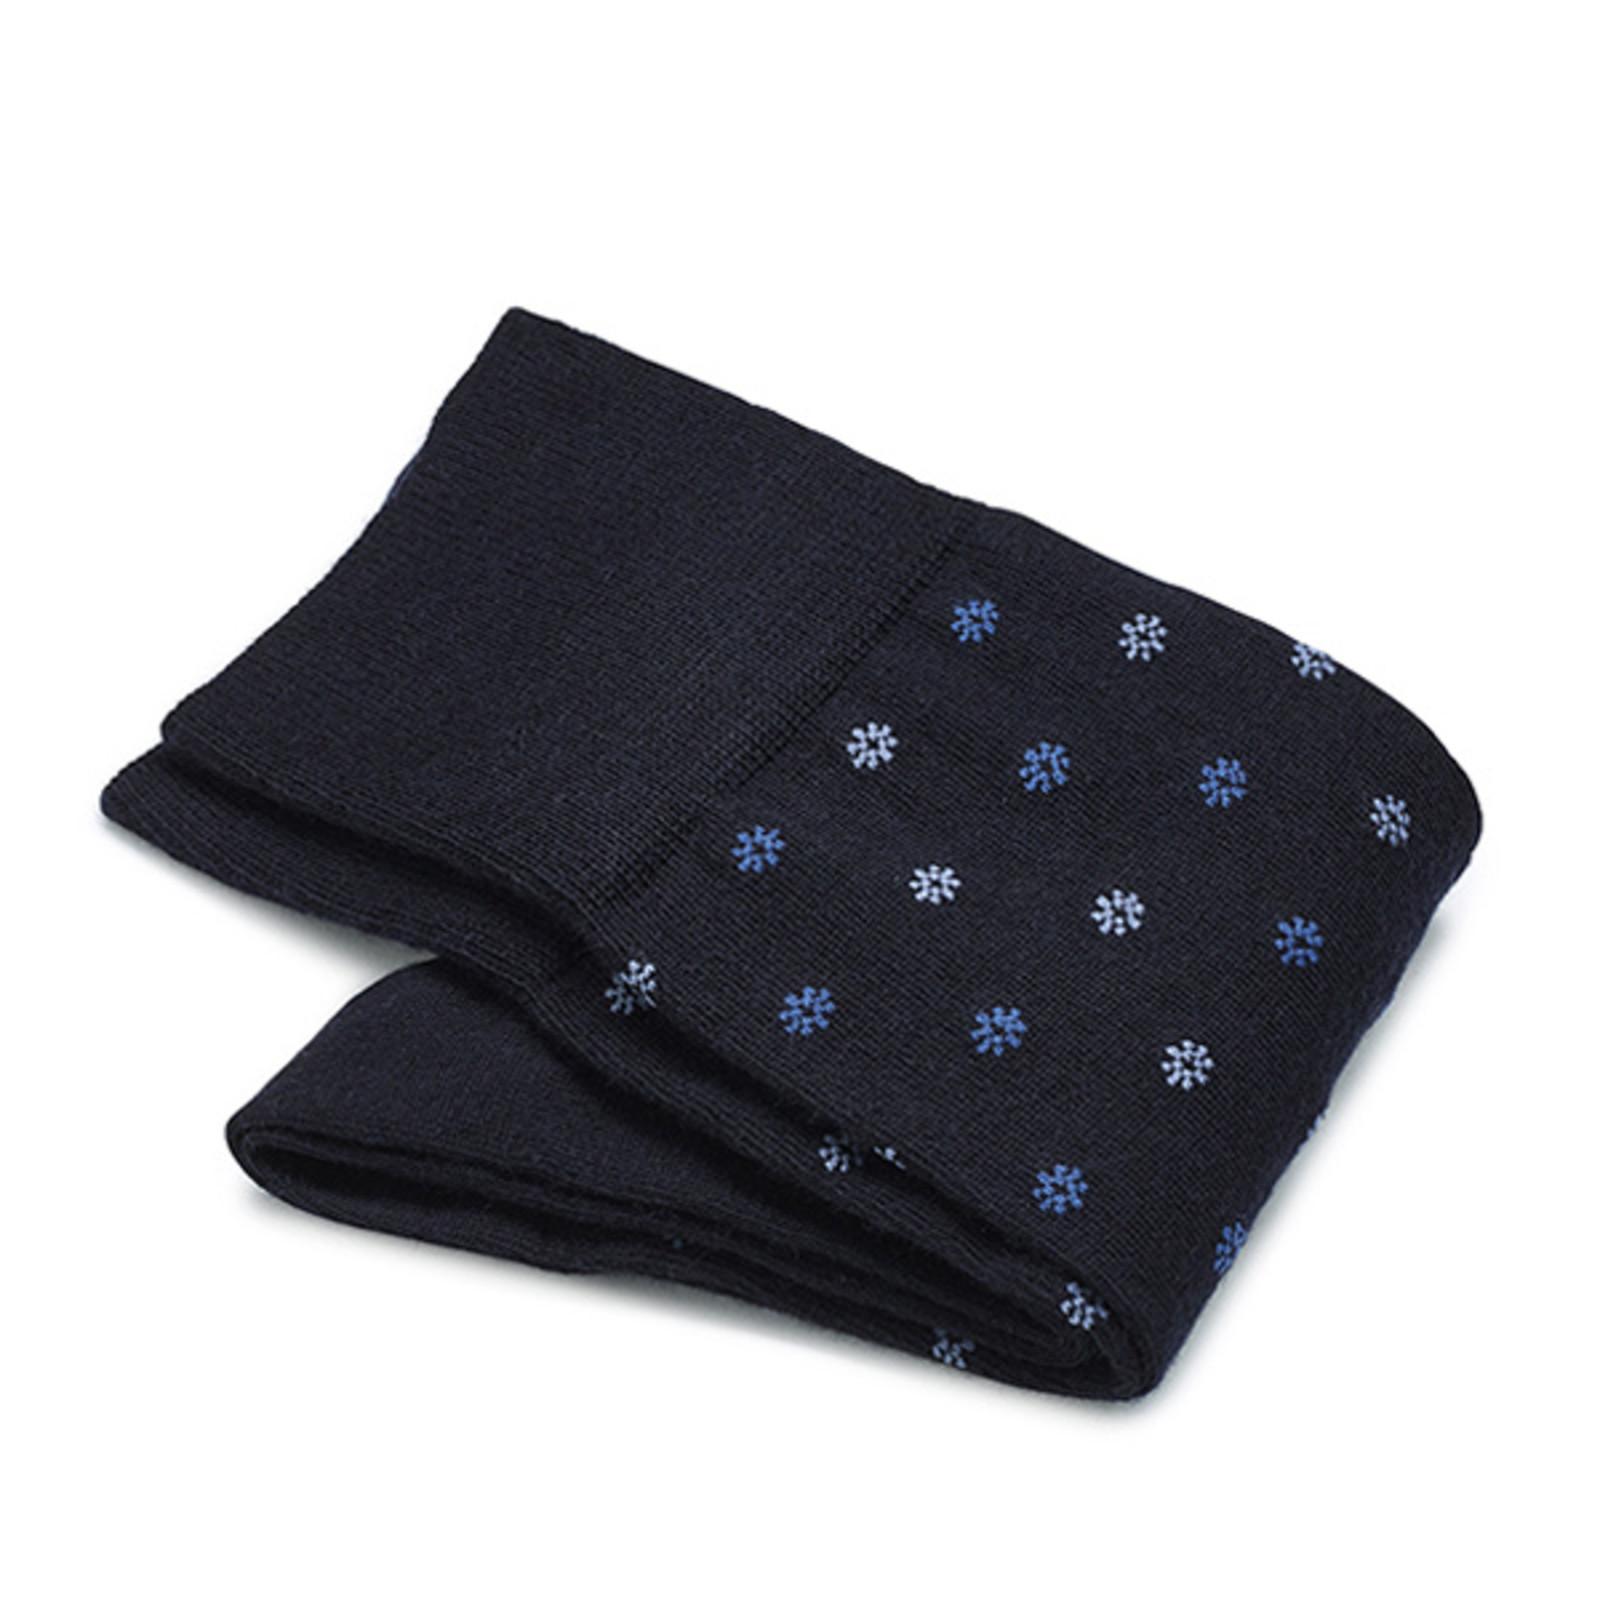 Carlo Lanza Donkerblauwe sokken fiore | Carlo Lanza